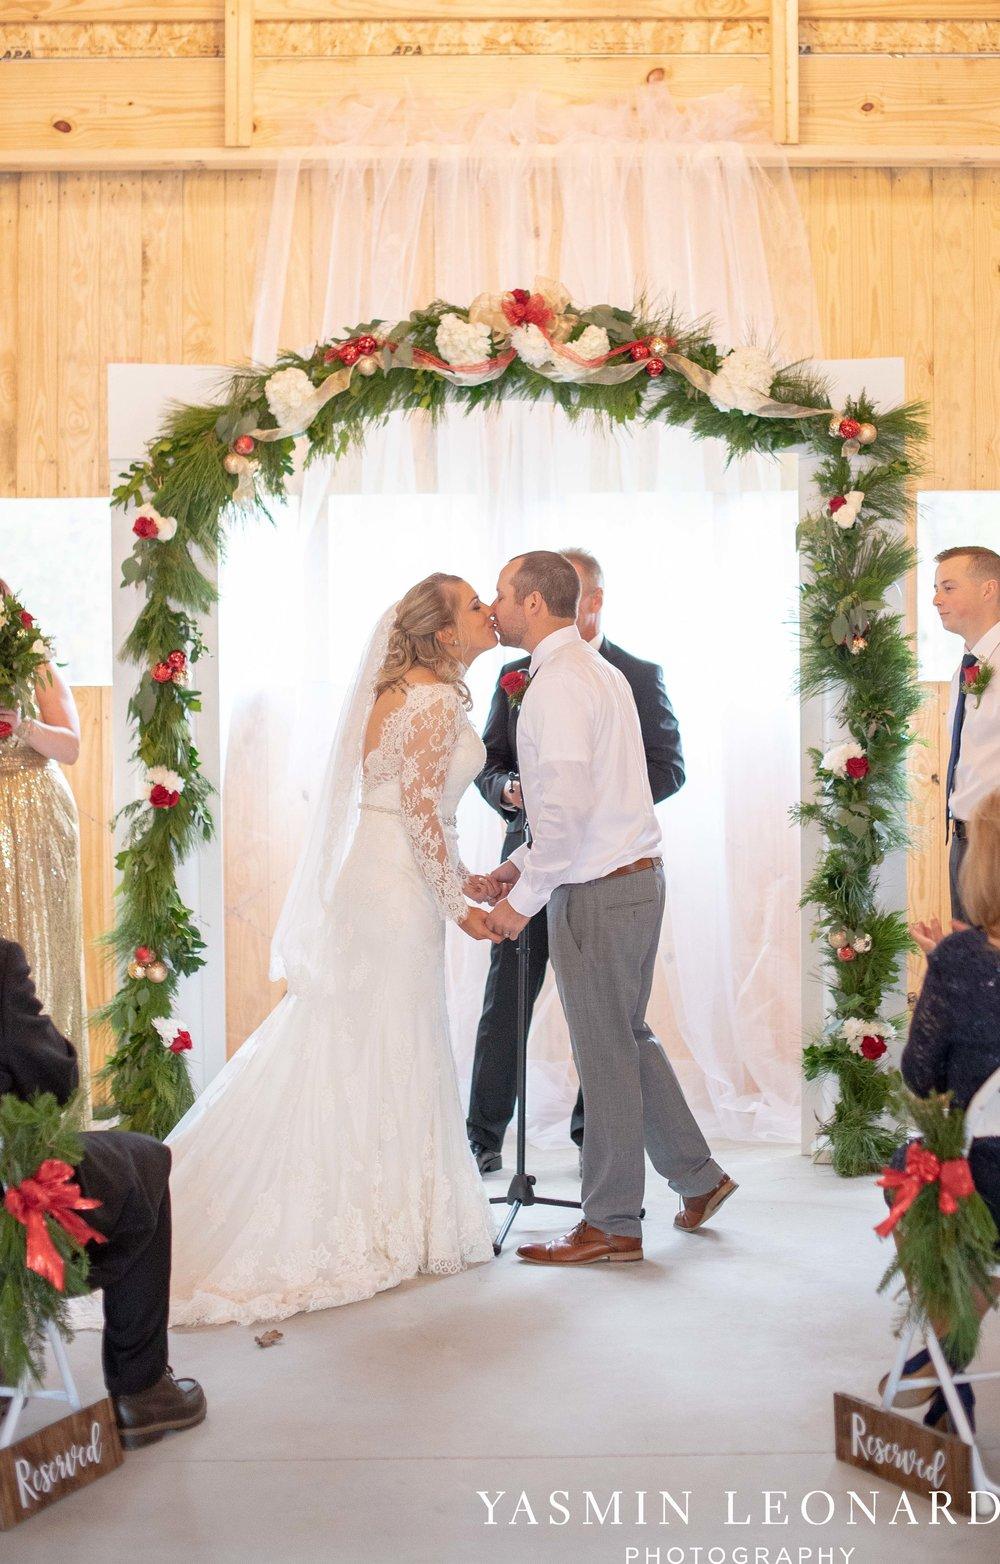 Secret Meadows at Green Dell Farm, NC Barns, NC Wedding Venues, Triad, NC, NC Wedding Photography, Triad Wedding Venues, Affordable Wedding Venues, NEW Wedding Venues, Christmas Weddings-21.jpg